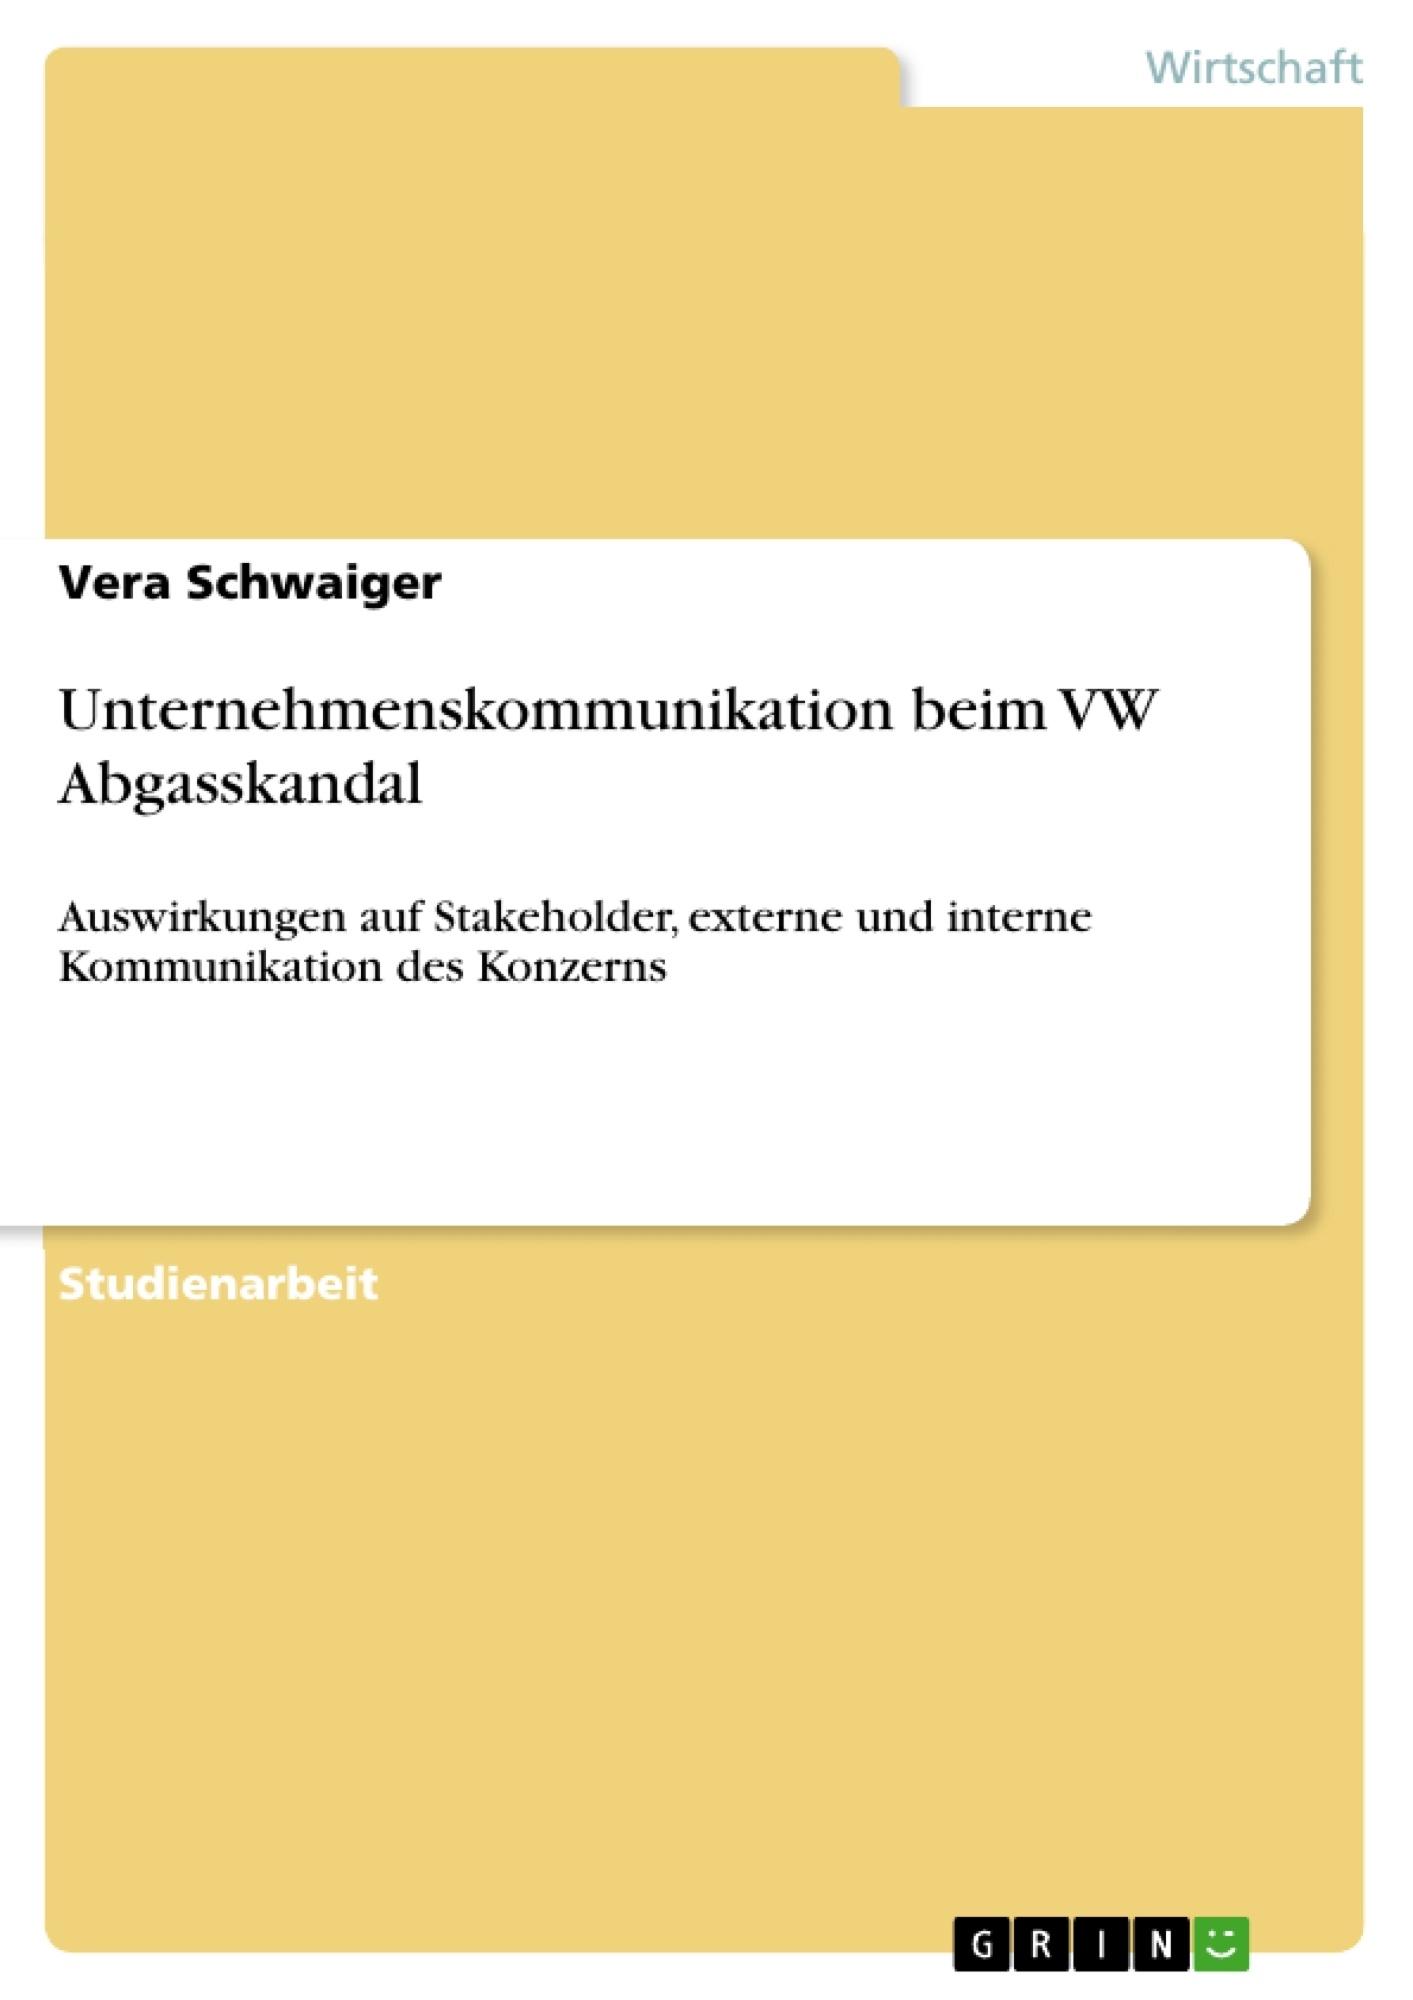 Titel: Unternehmenskommunikation beim VW Abgasskandal